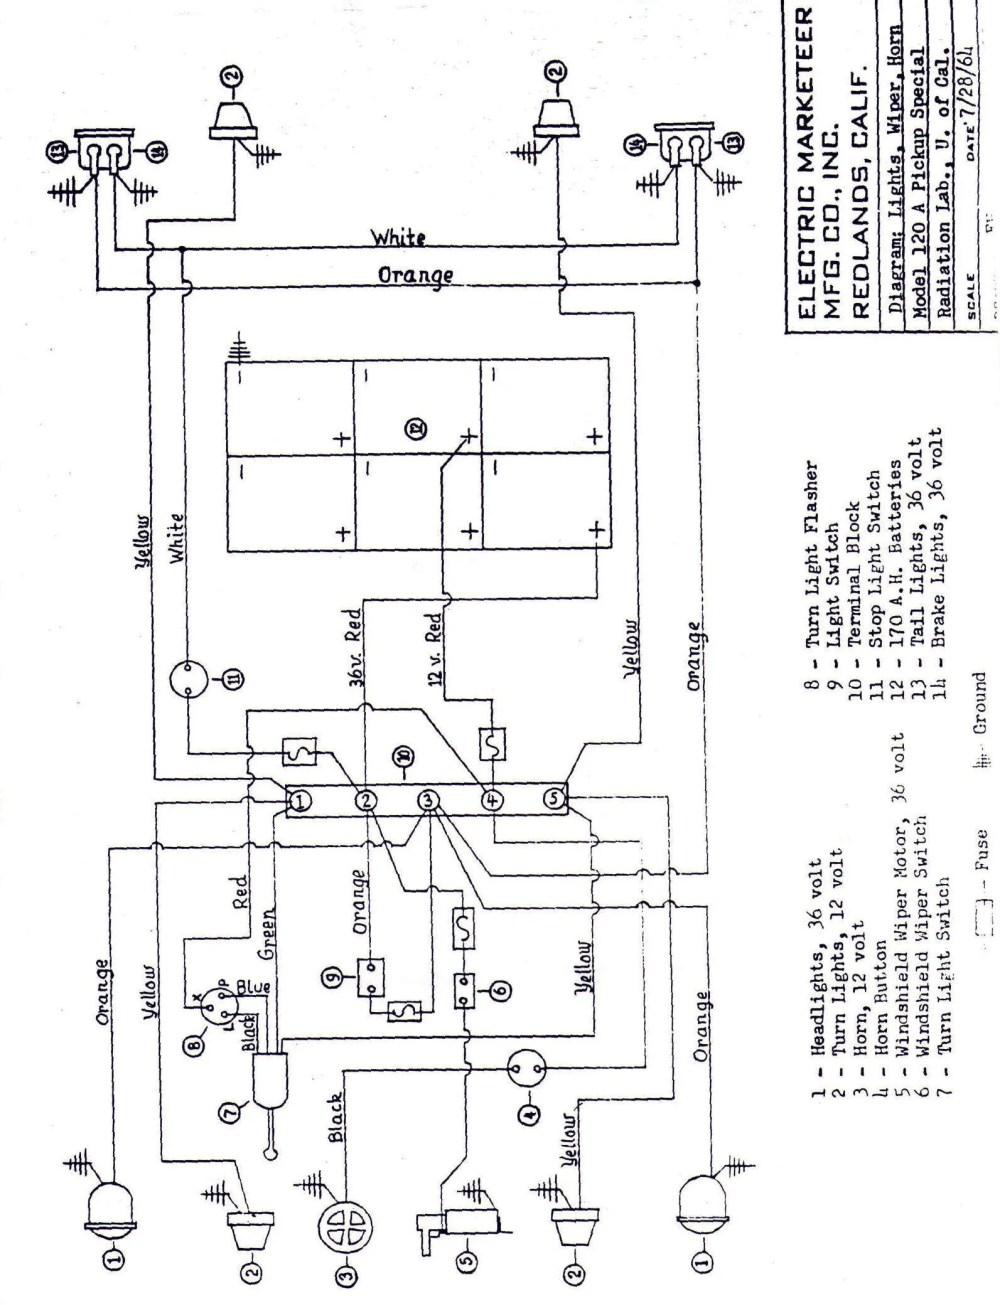 medium resolution of nordskog wiring diagram for a wiring diagramvintagegolfcartparts comnordskog wiring diagram for a 7